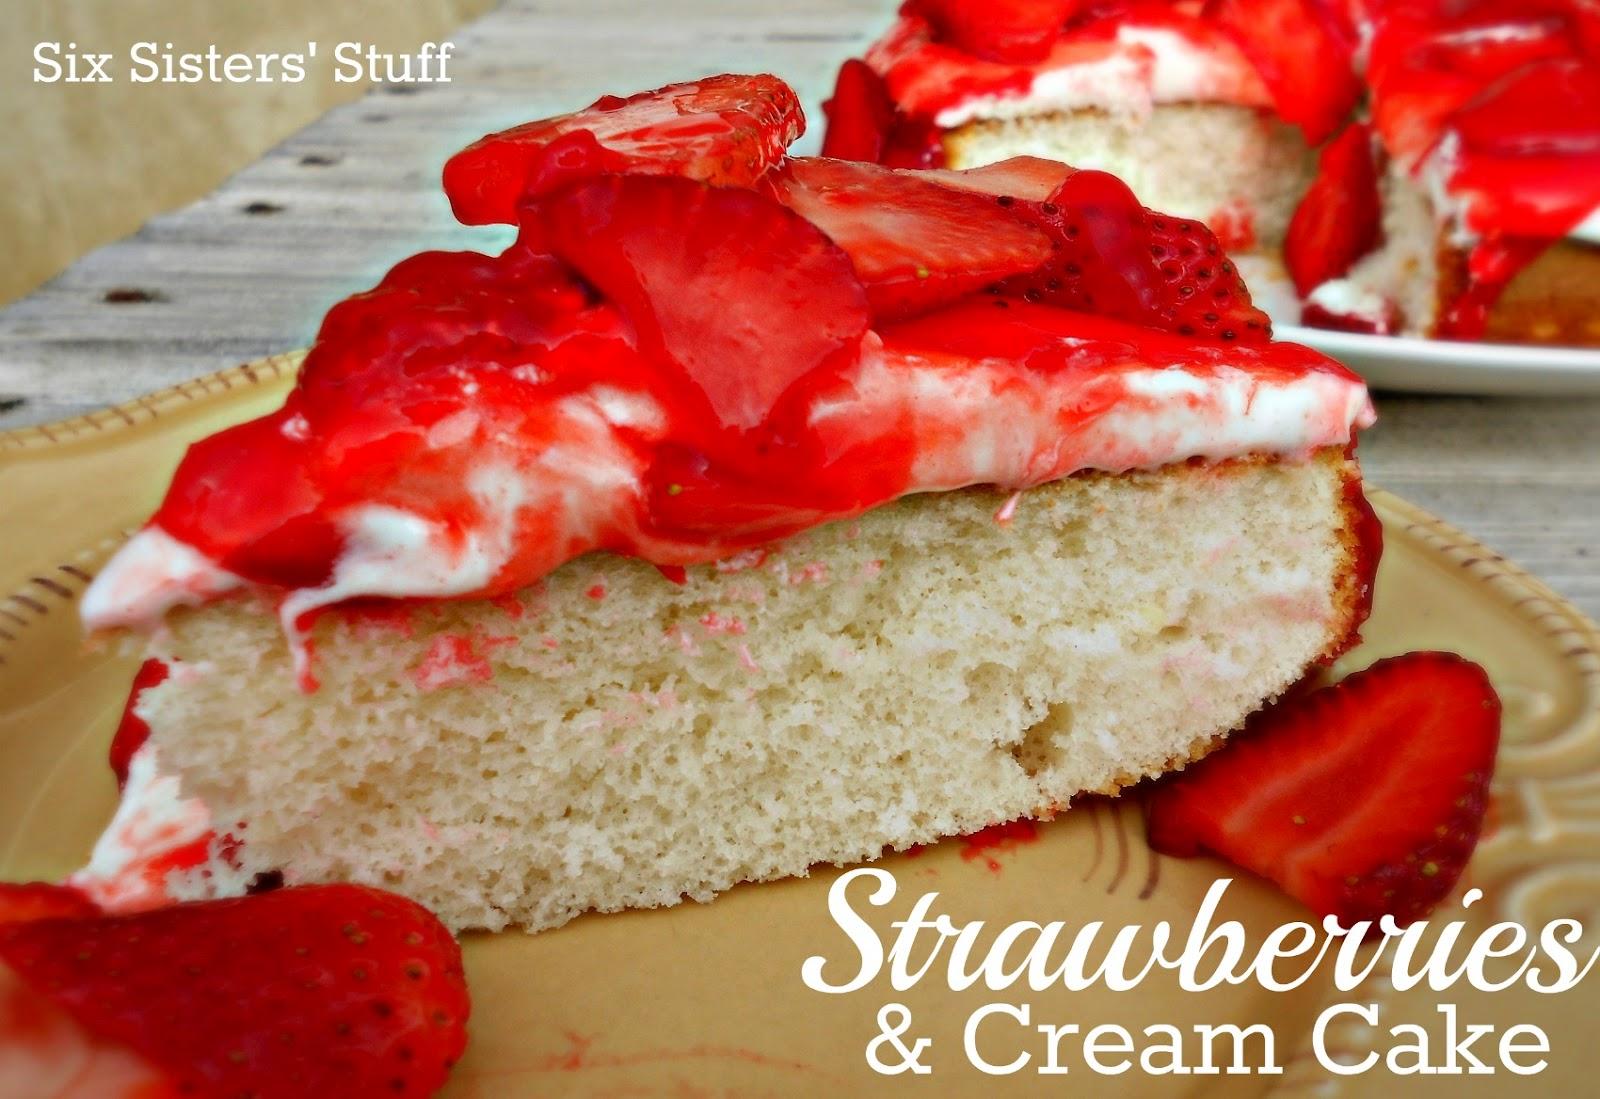 Strawberries and Cream Cake | Six Sisters' Stuff